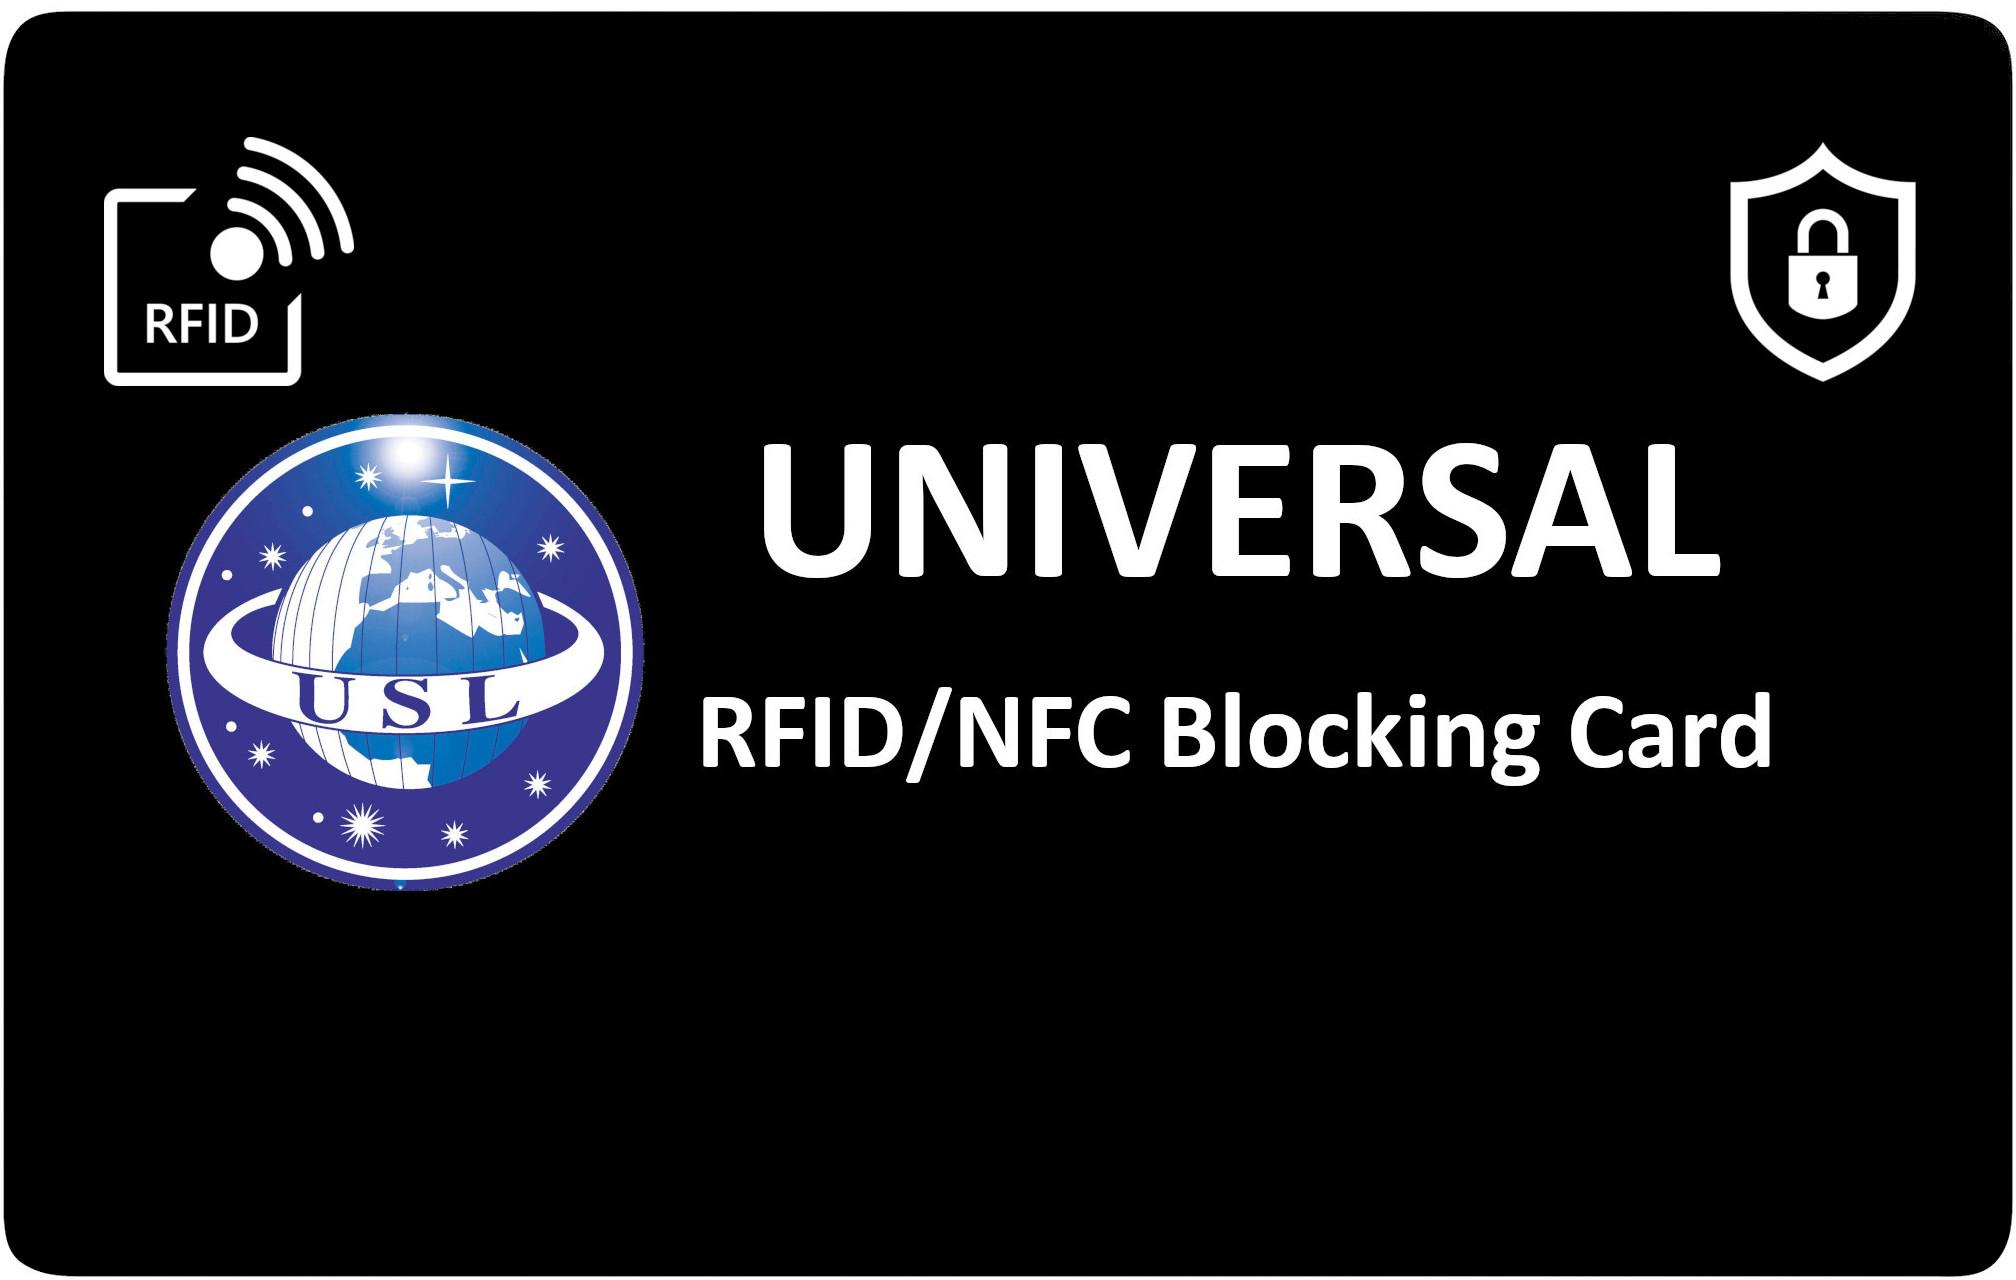 69c1bfe96eec Universal RFID Blocking Card